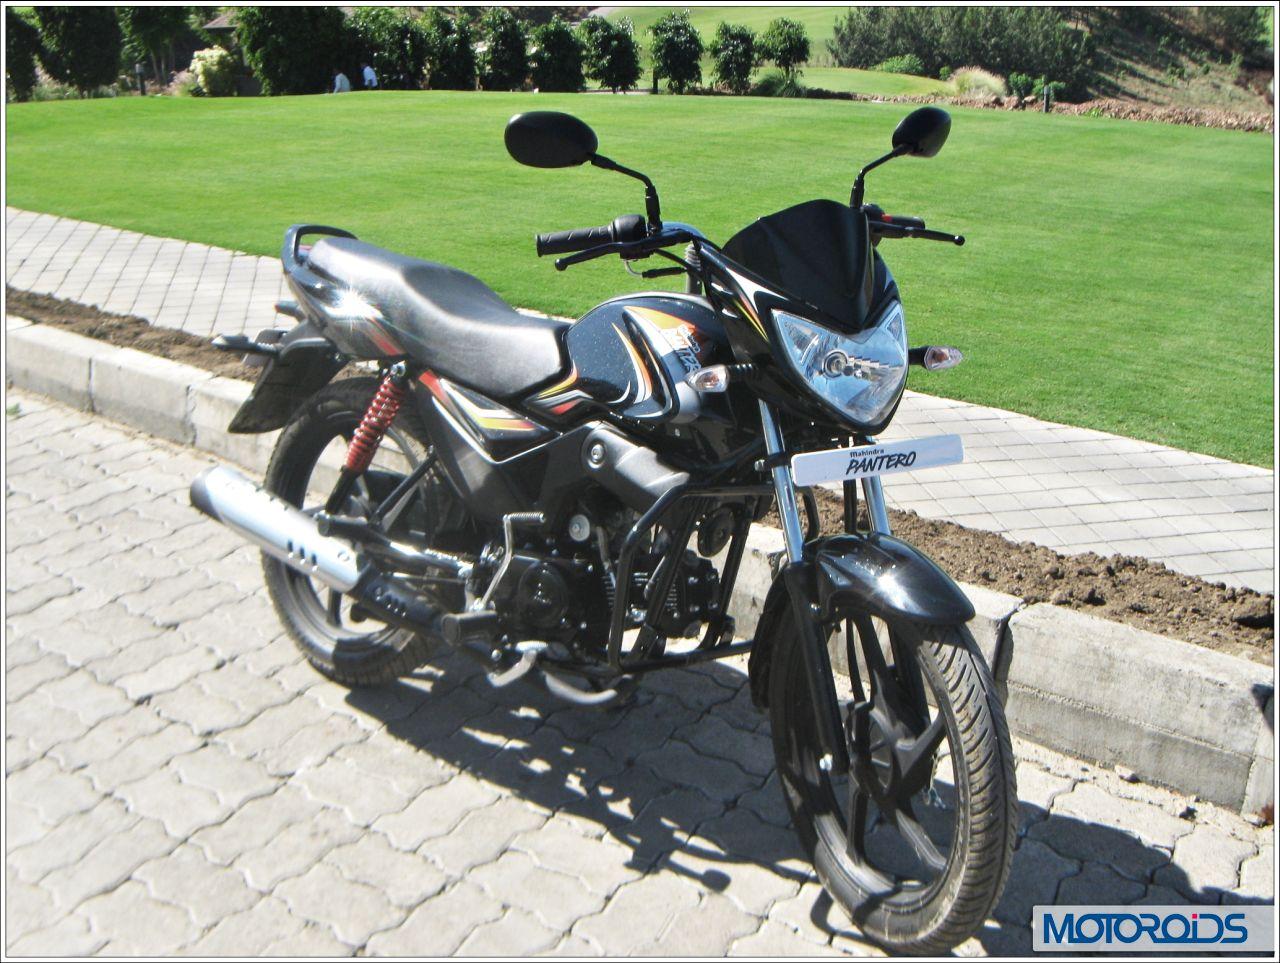 Mahindra-Pantero-110-91